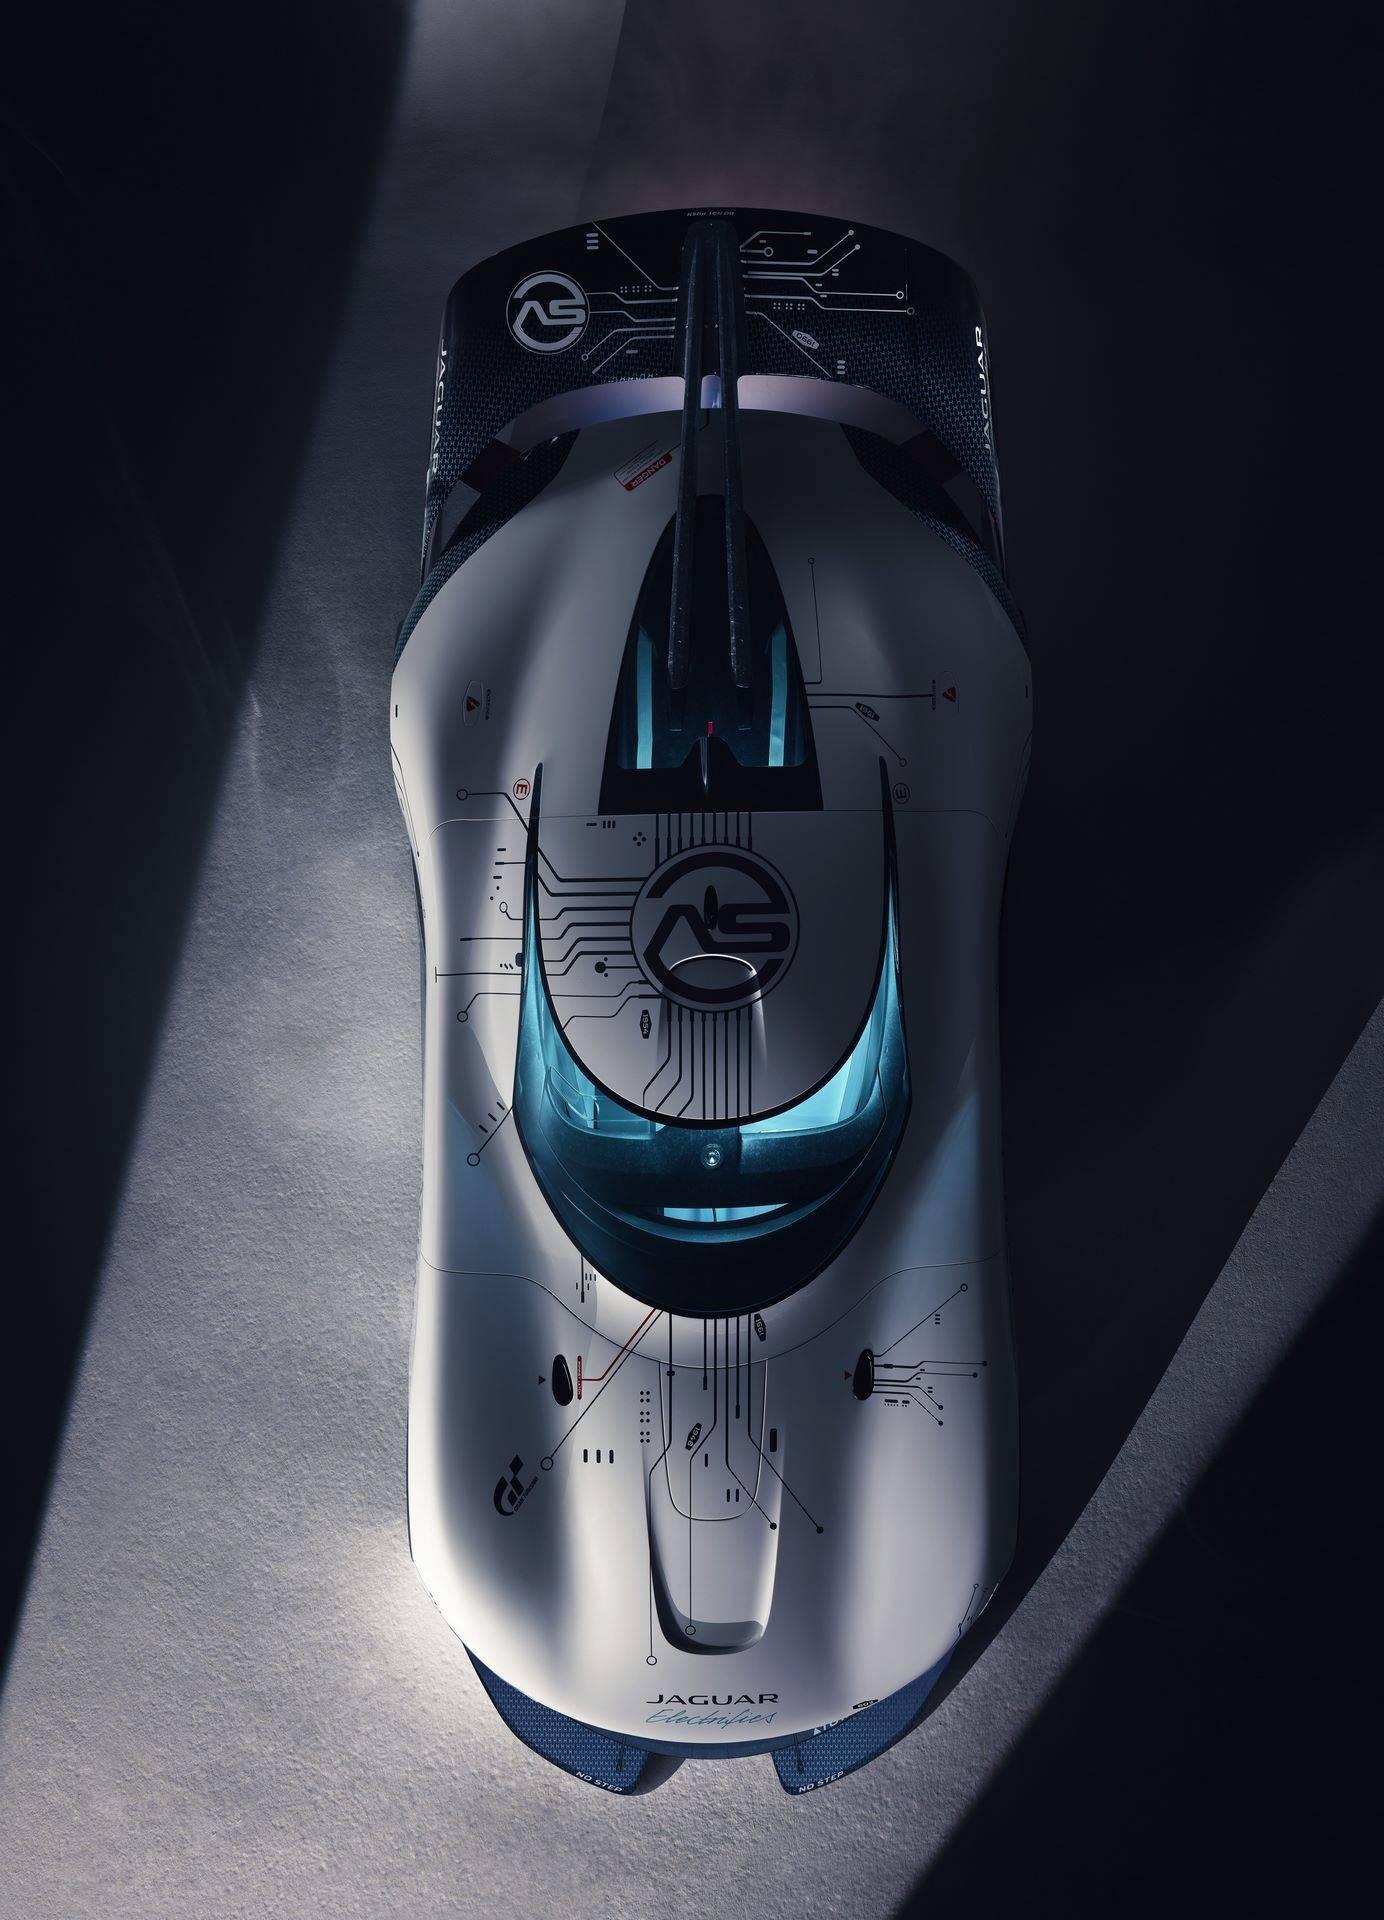 Jaguar-Vision-Gran-Turismo-SV-39